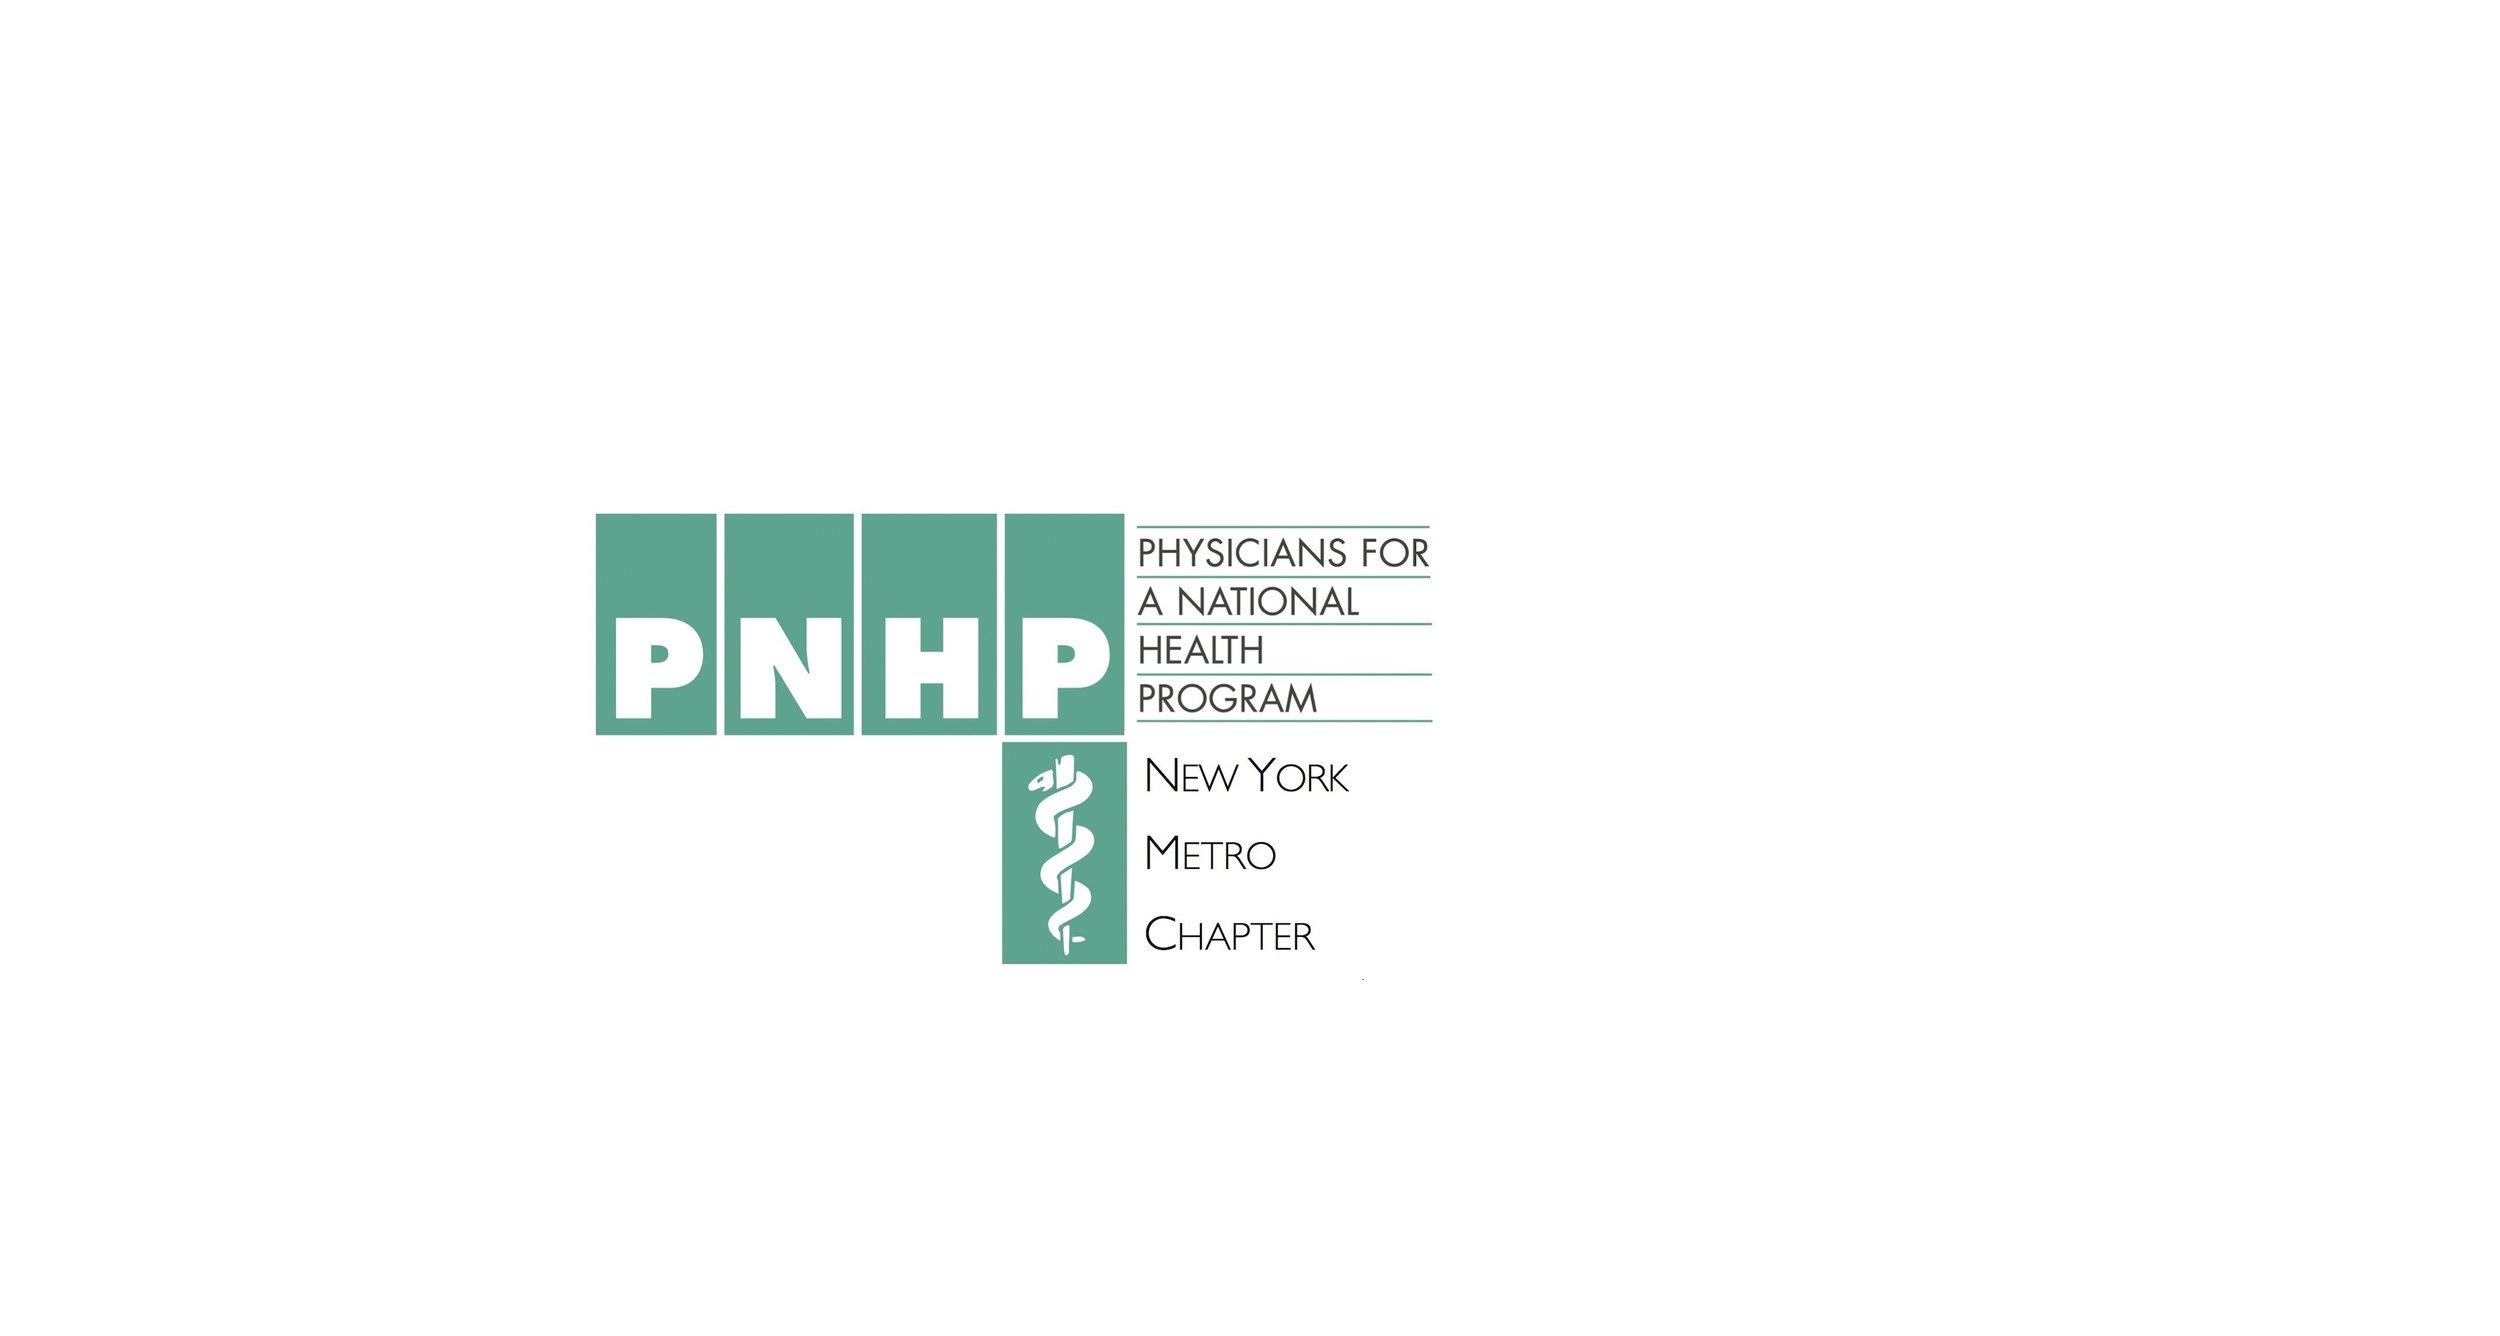 PNHP NY Metro logobannerHiRes.jpg